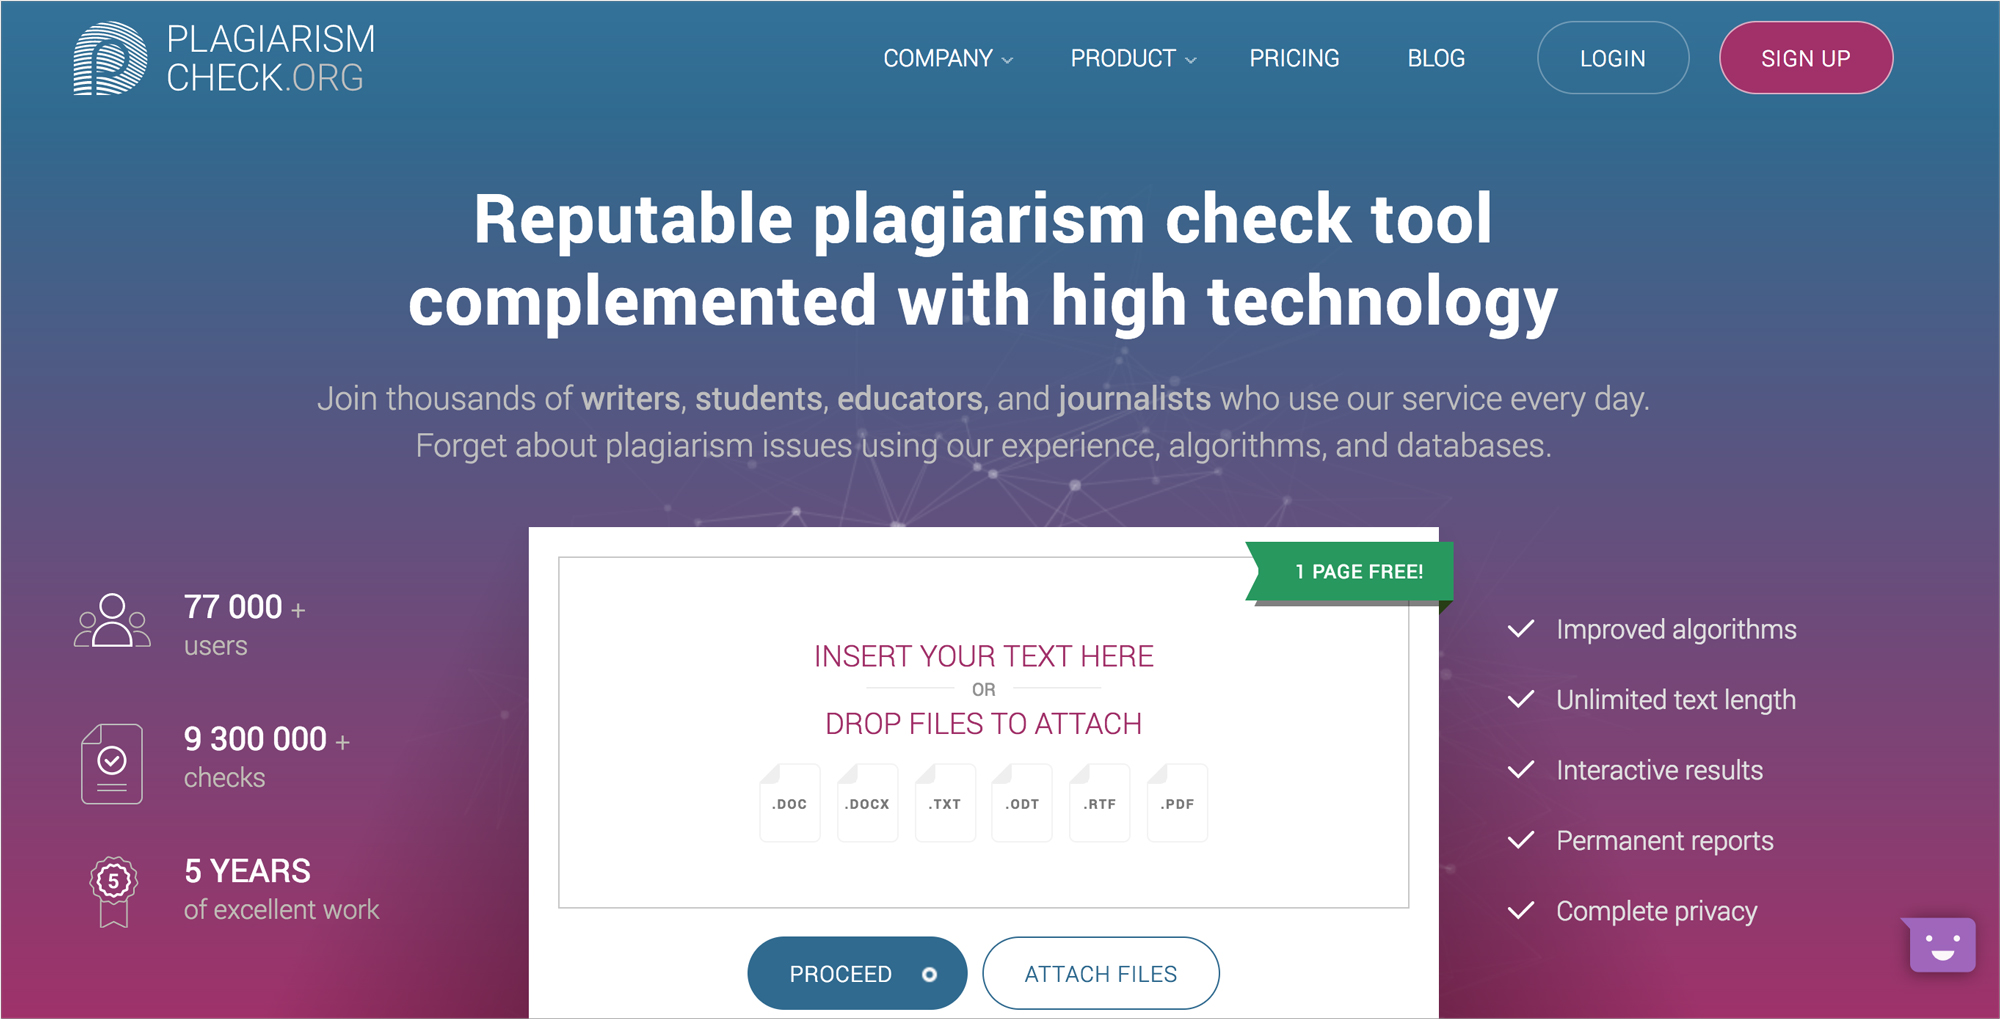 plagiarism check digital marketing tool ann smarty tips